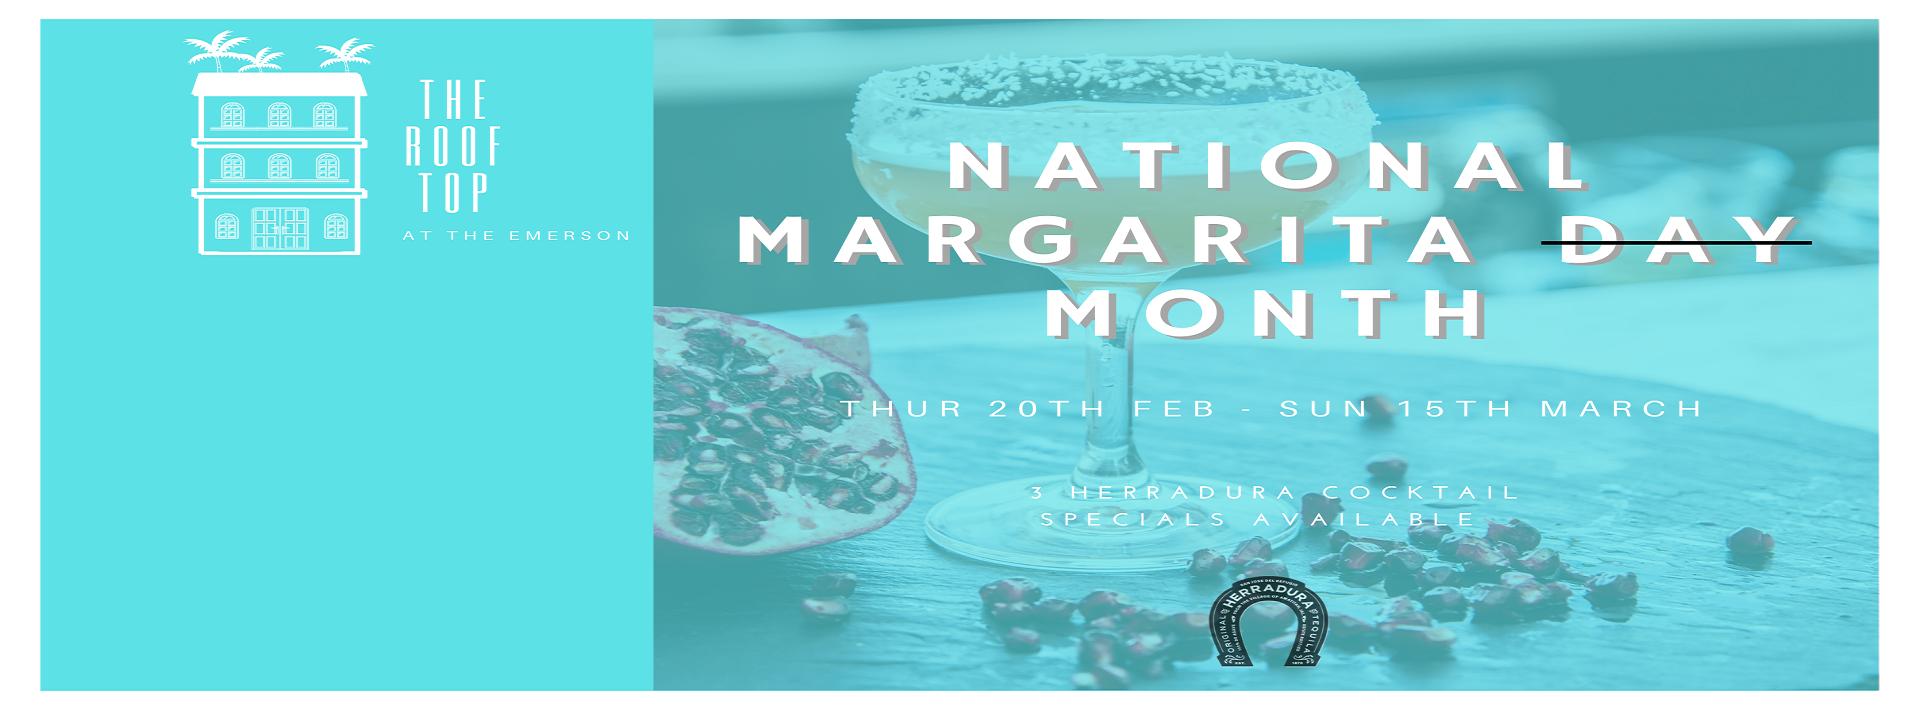 National Margarita Month Website Banner